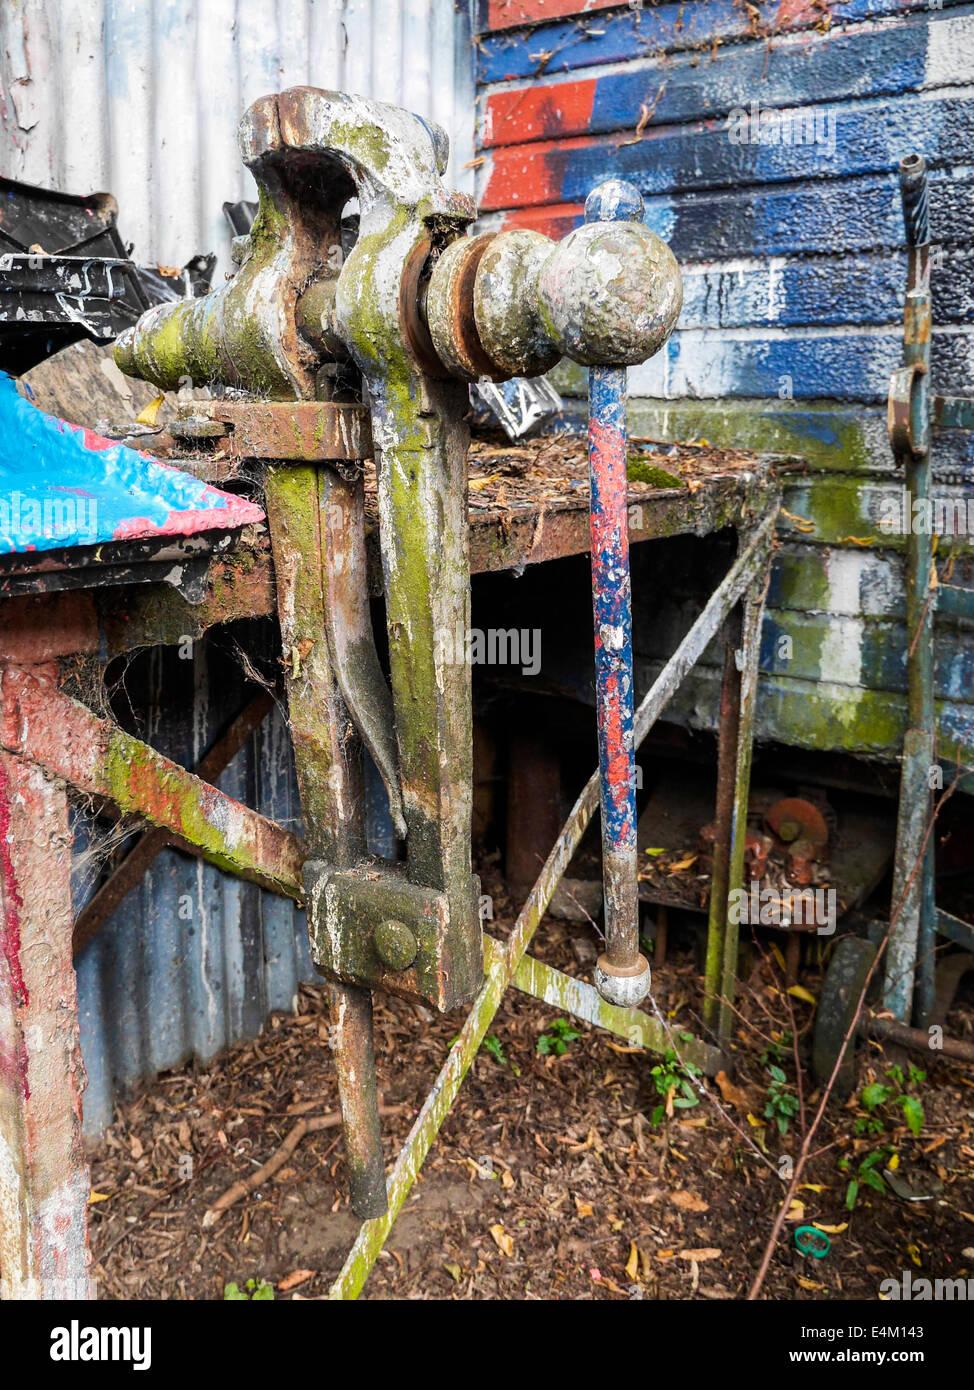 Vintage Leg Vice outside Artist's studio workshop with paint covered work bench, Eel Pie Island, Twickenham, - Stock Image